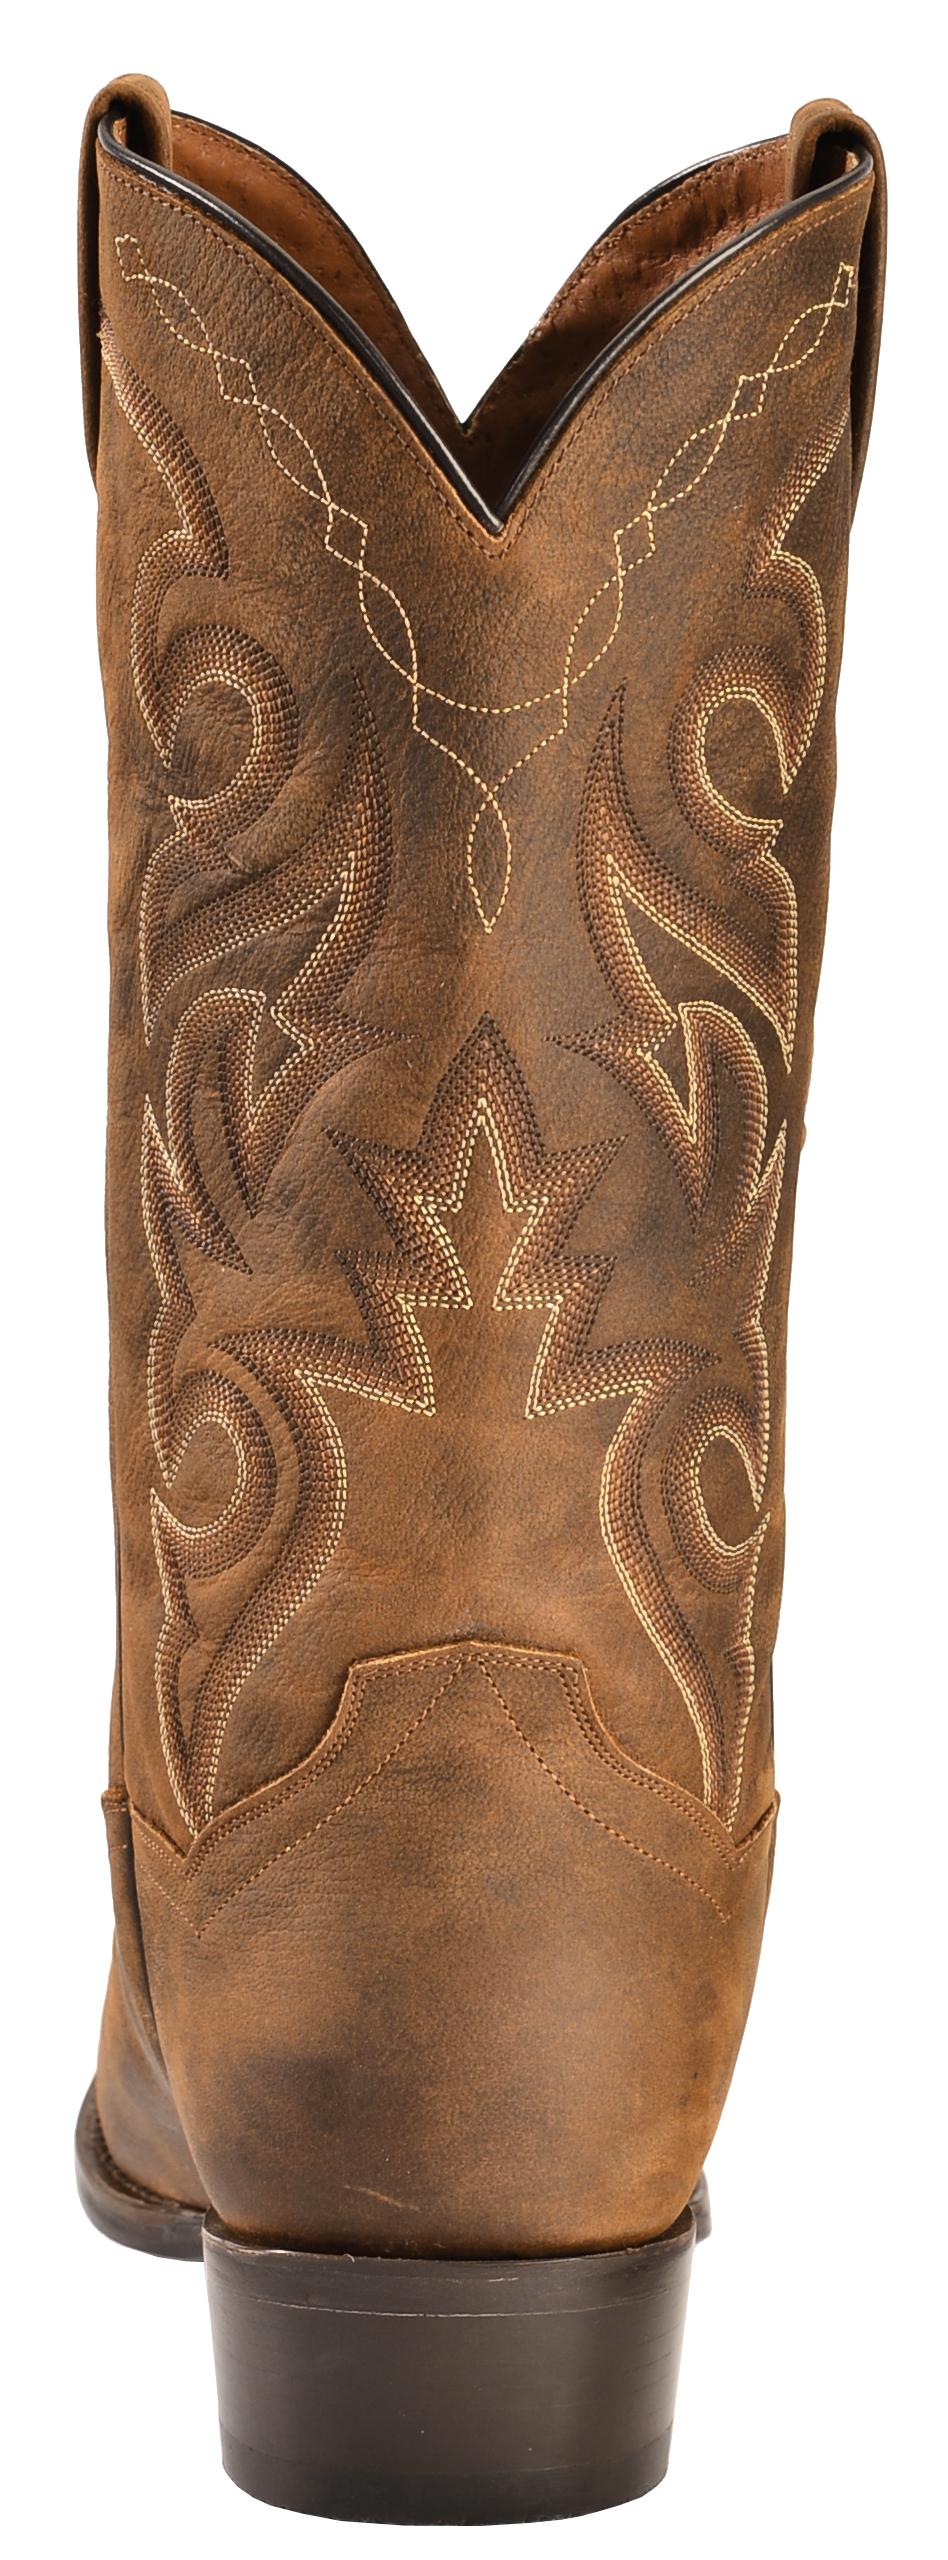 Dan Post Renegade Mignon Cowboy Boots Snip Toe Country